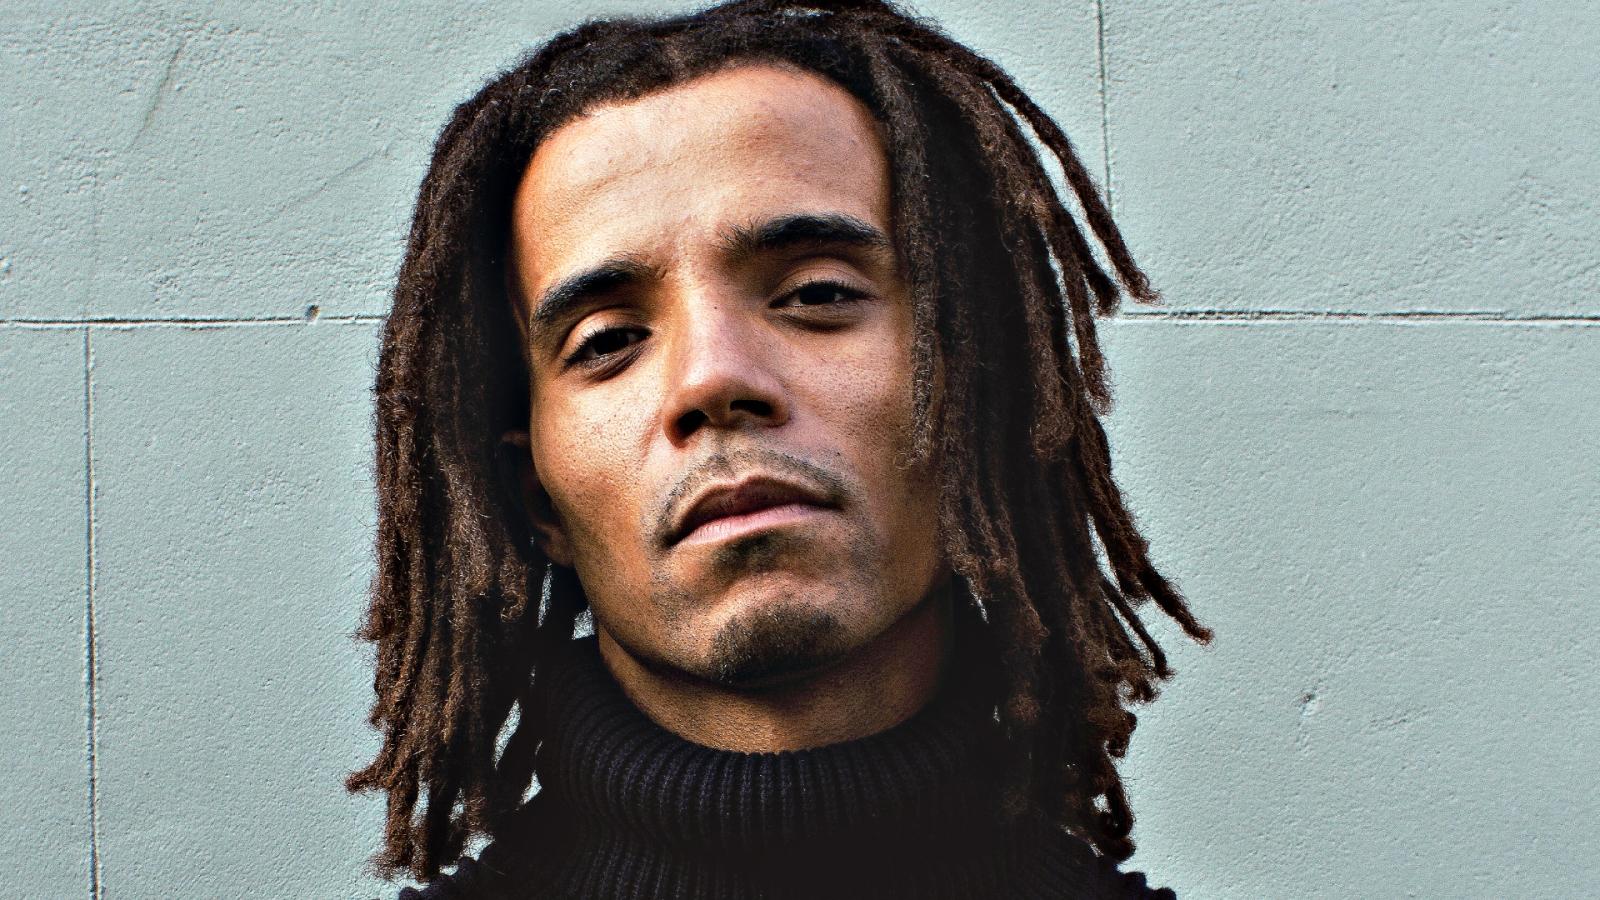 u-k-rapper-akala-on-trap-music-kendrick-lamar-and-lyricism-in-hip-hop